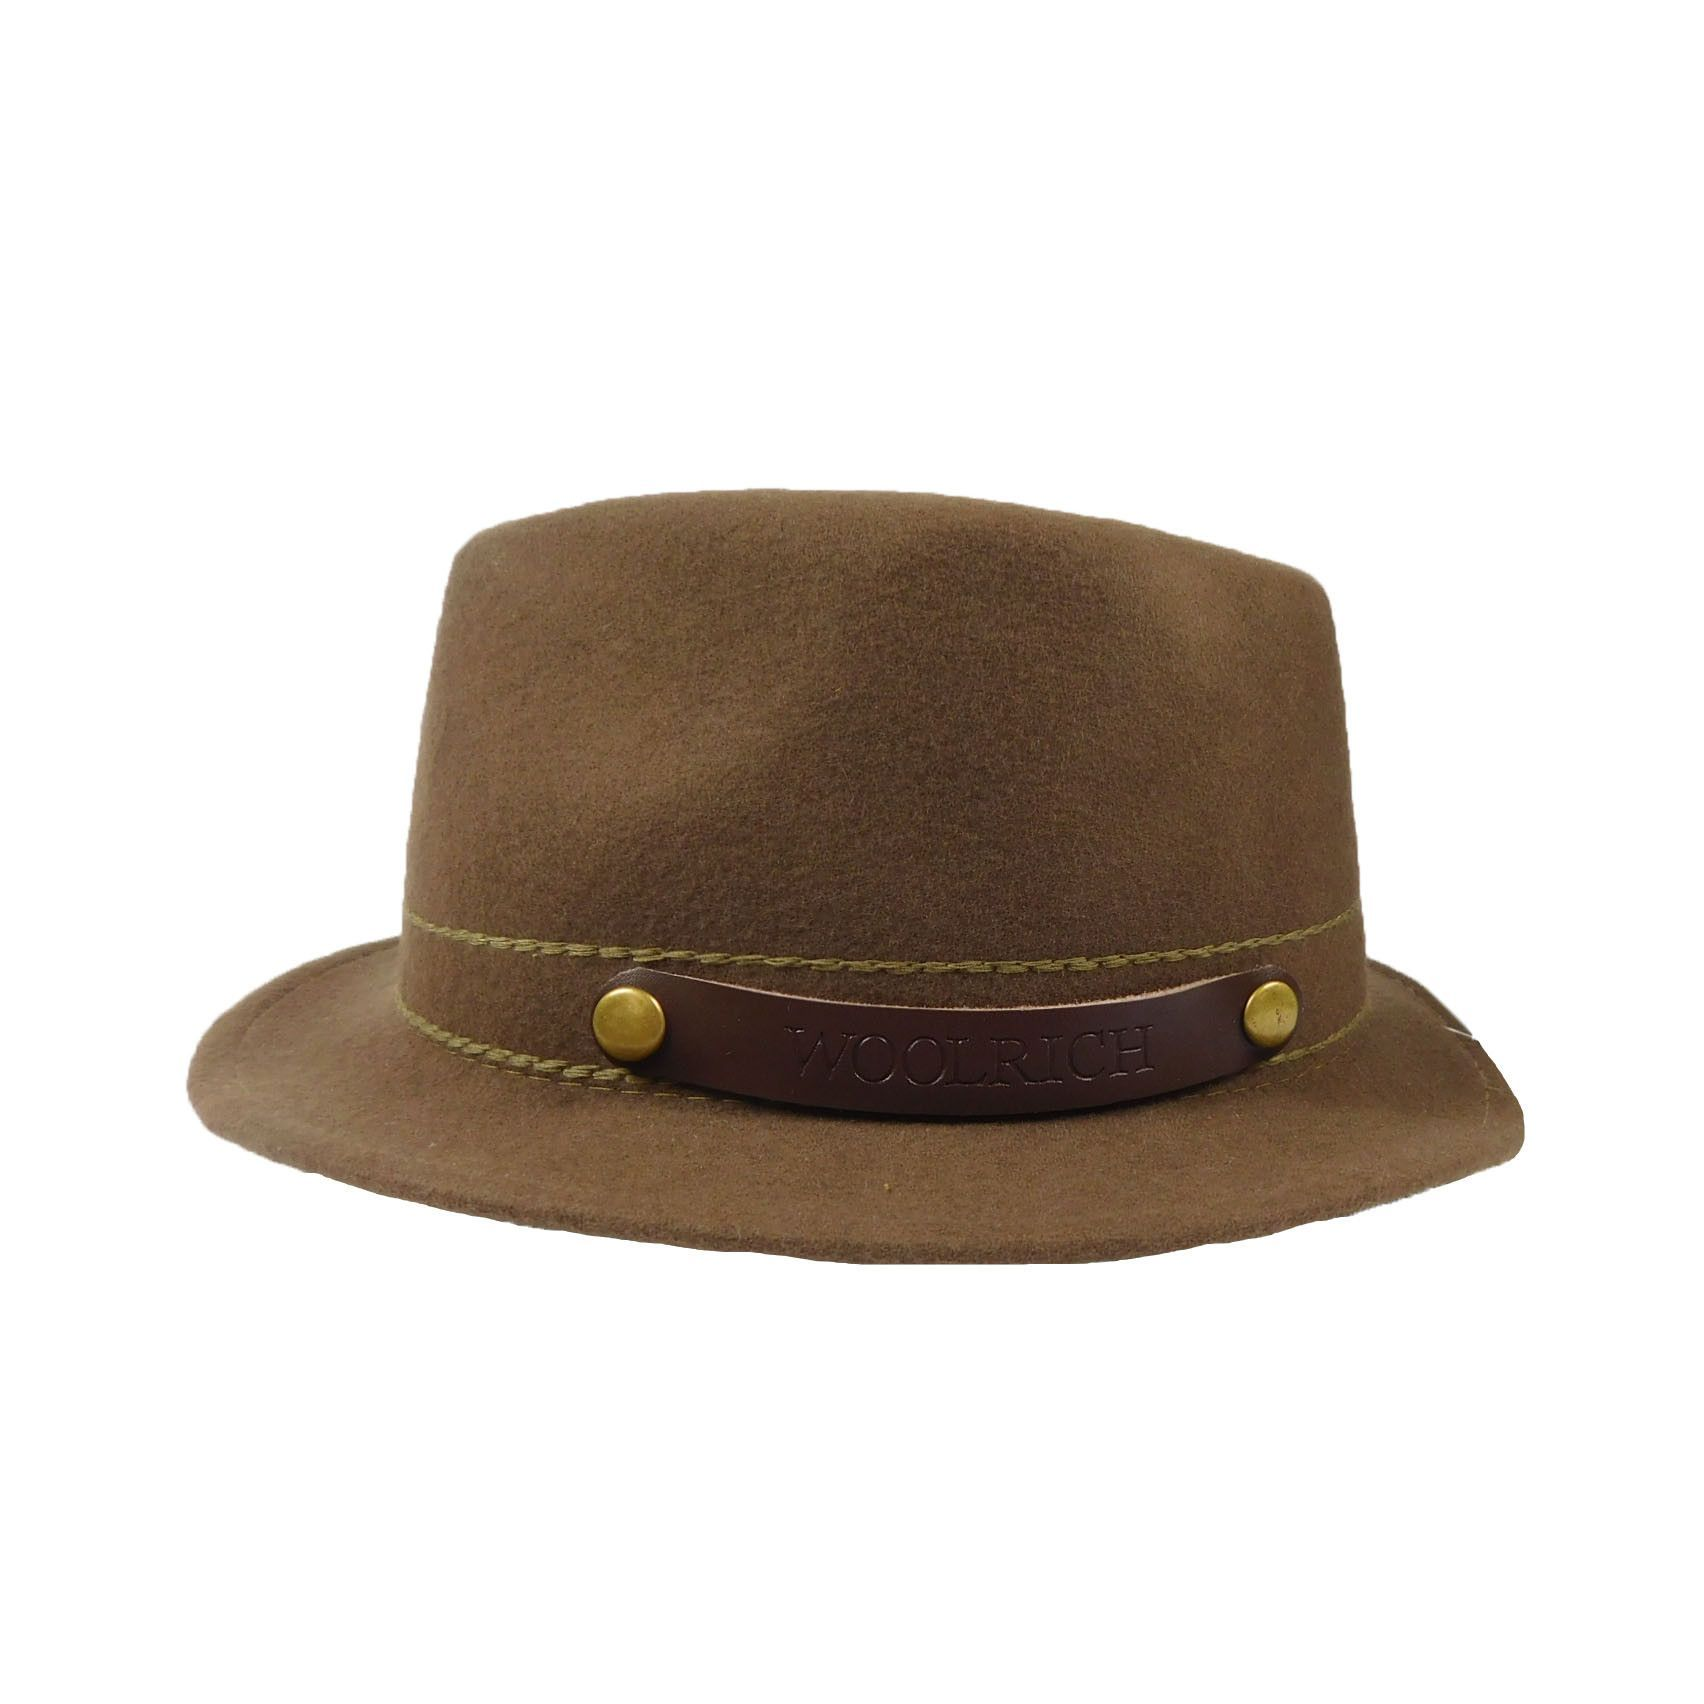 27643c4a Woolrich Roll Up Fedora | Hats for Adventurers | Winter hats, Hats ...